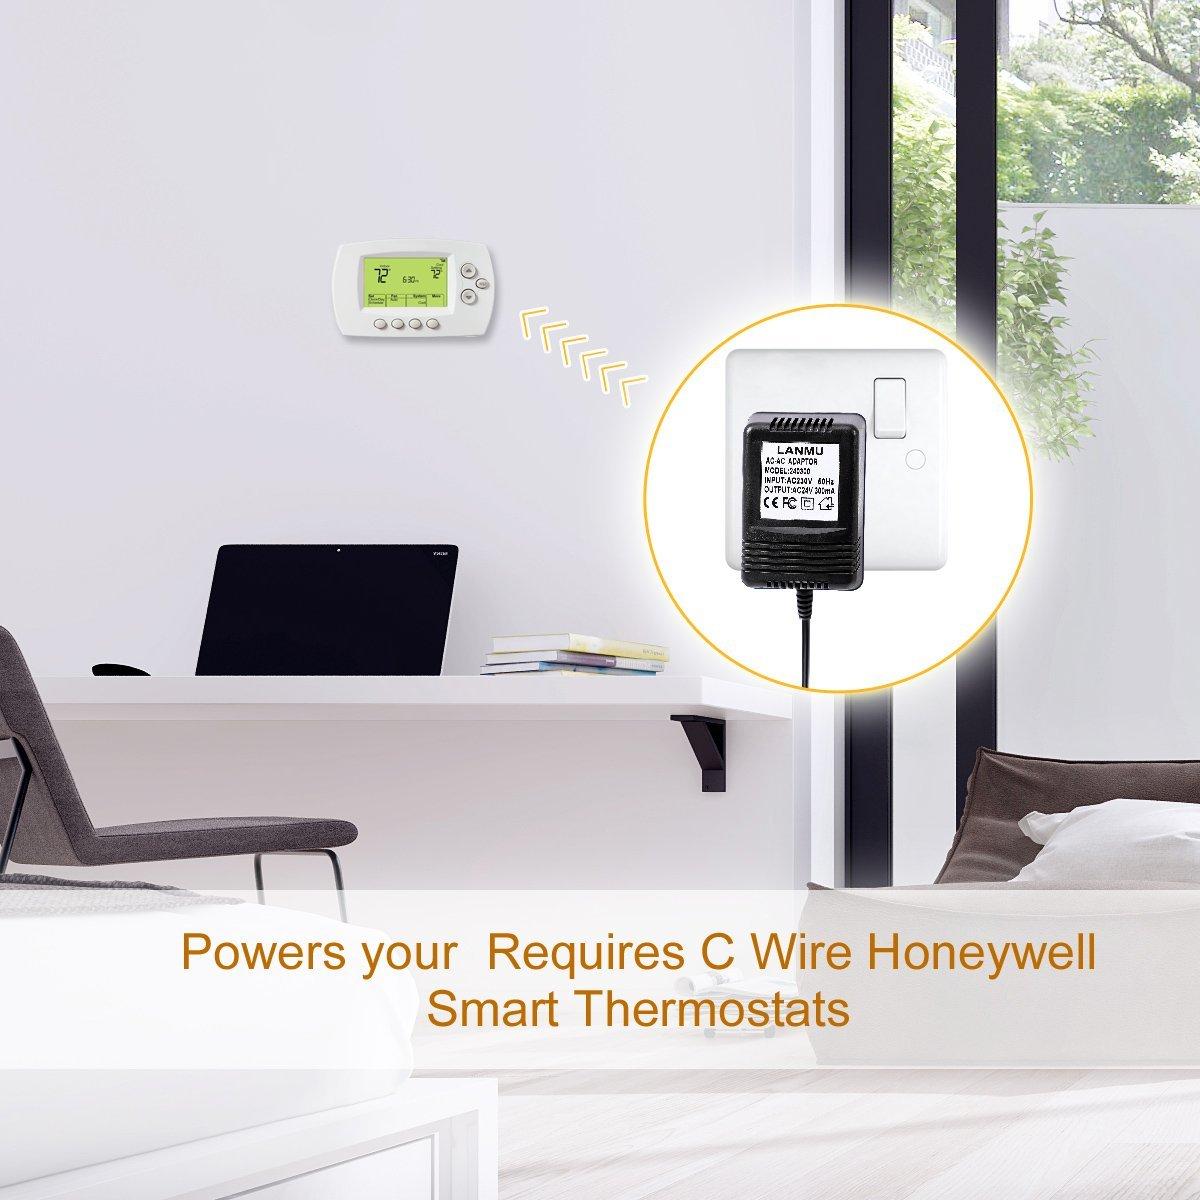 Transformer Wiring Diagram Honeywell Get Free Image About Wiring